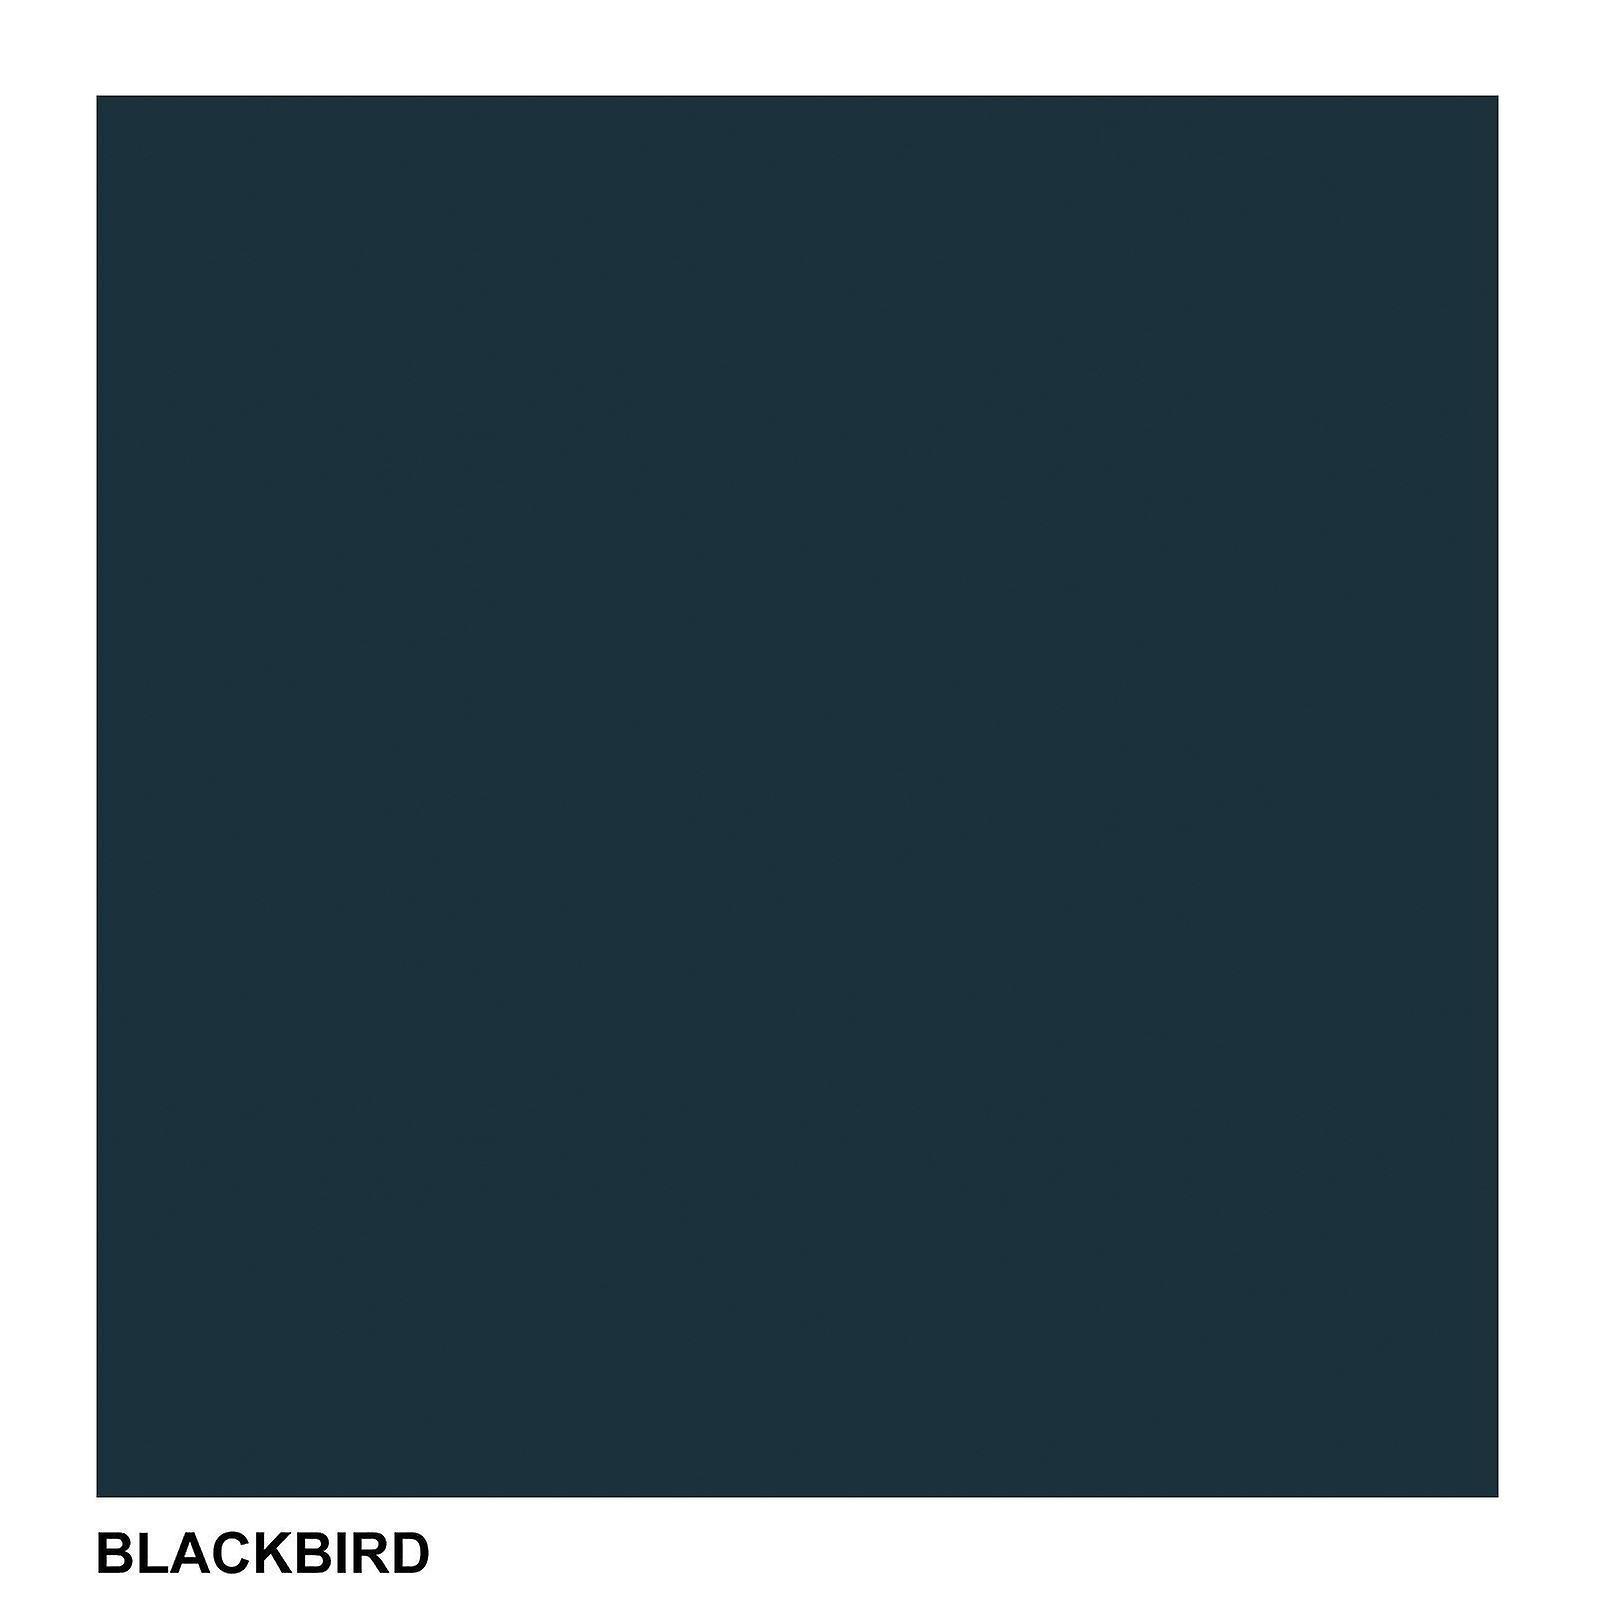 Vernice Ronseal giardino 2,5 L - Blackbird